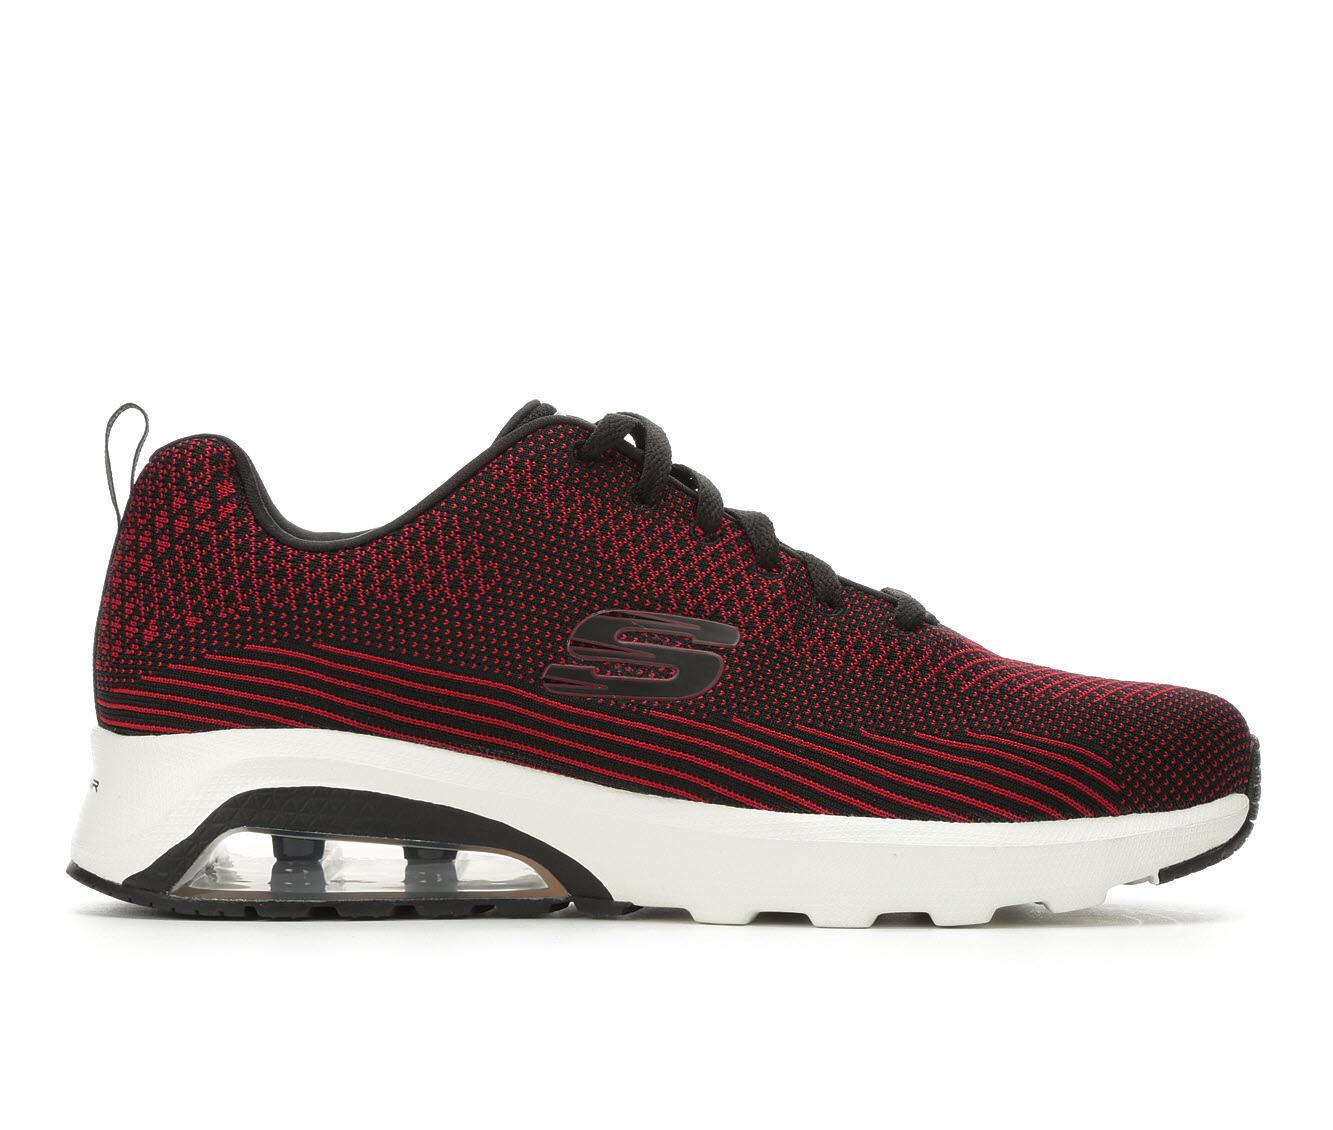 Men's Skechers Skech AIr 51490 Running Shoes Red/Black